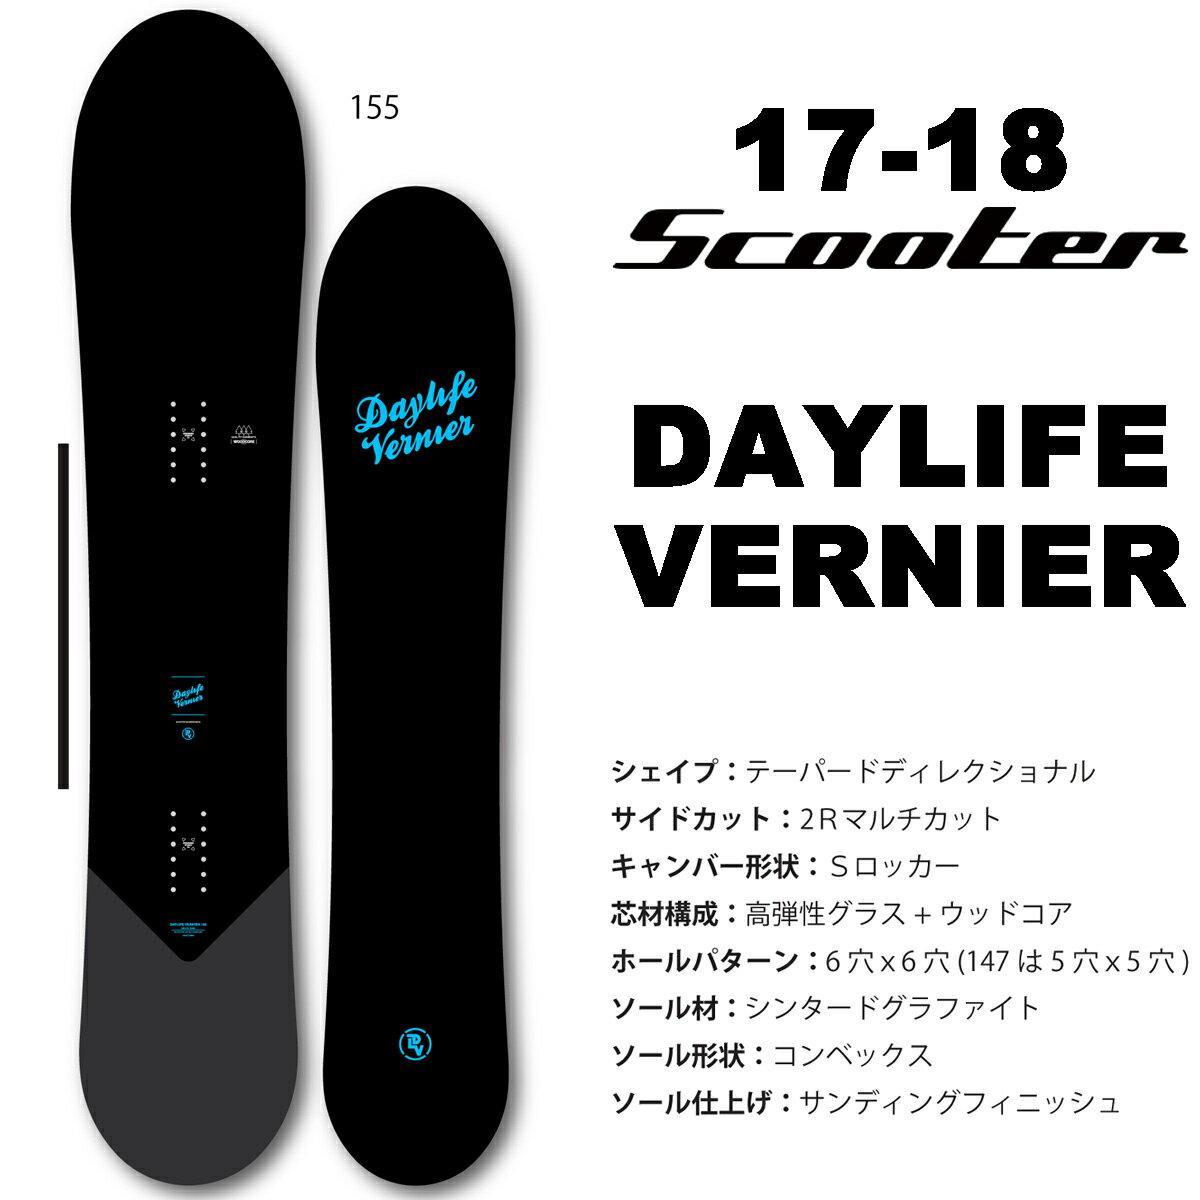 17-18 SCOOTER DAYLIFE-VERNIER/17-18 スクーター DAYLIFE-VERNIER/SCOOTER キャンバー/SCOOTER スノーボード/スクーター スノーボード/デイライフ バーニア/155